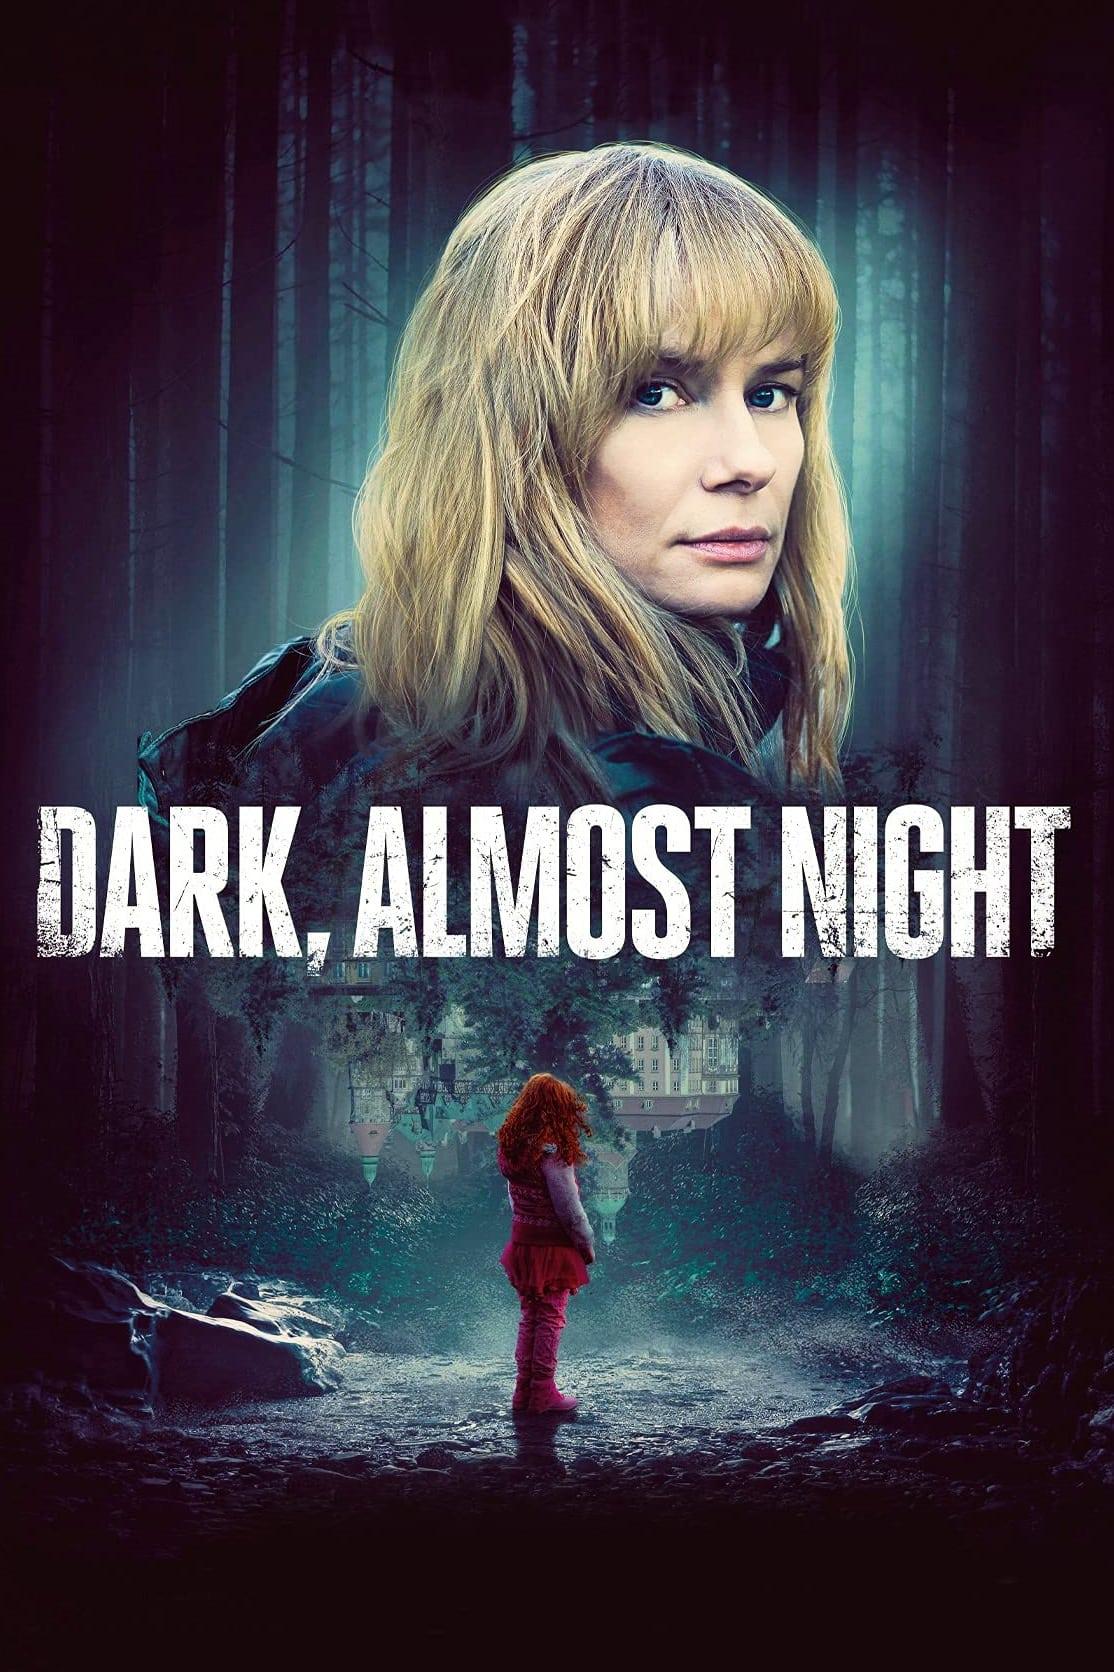 Dark, Almost Night